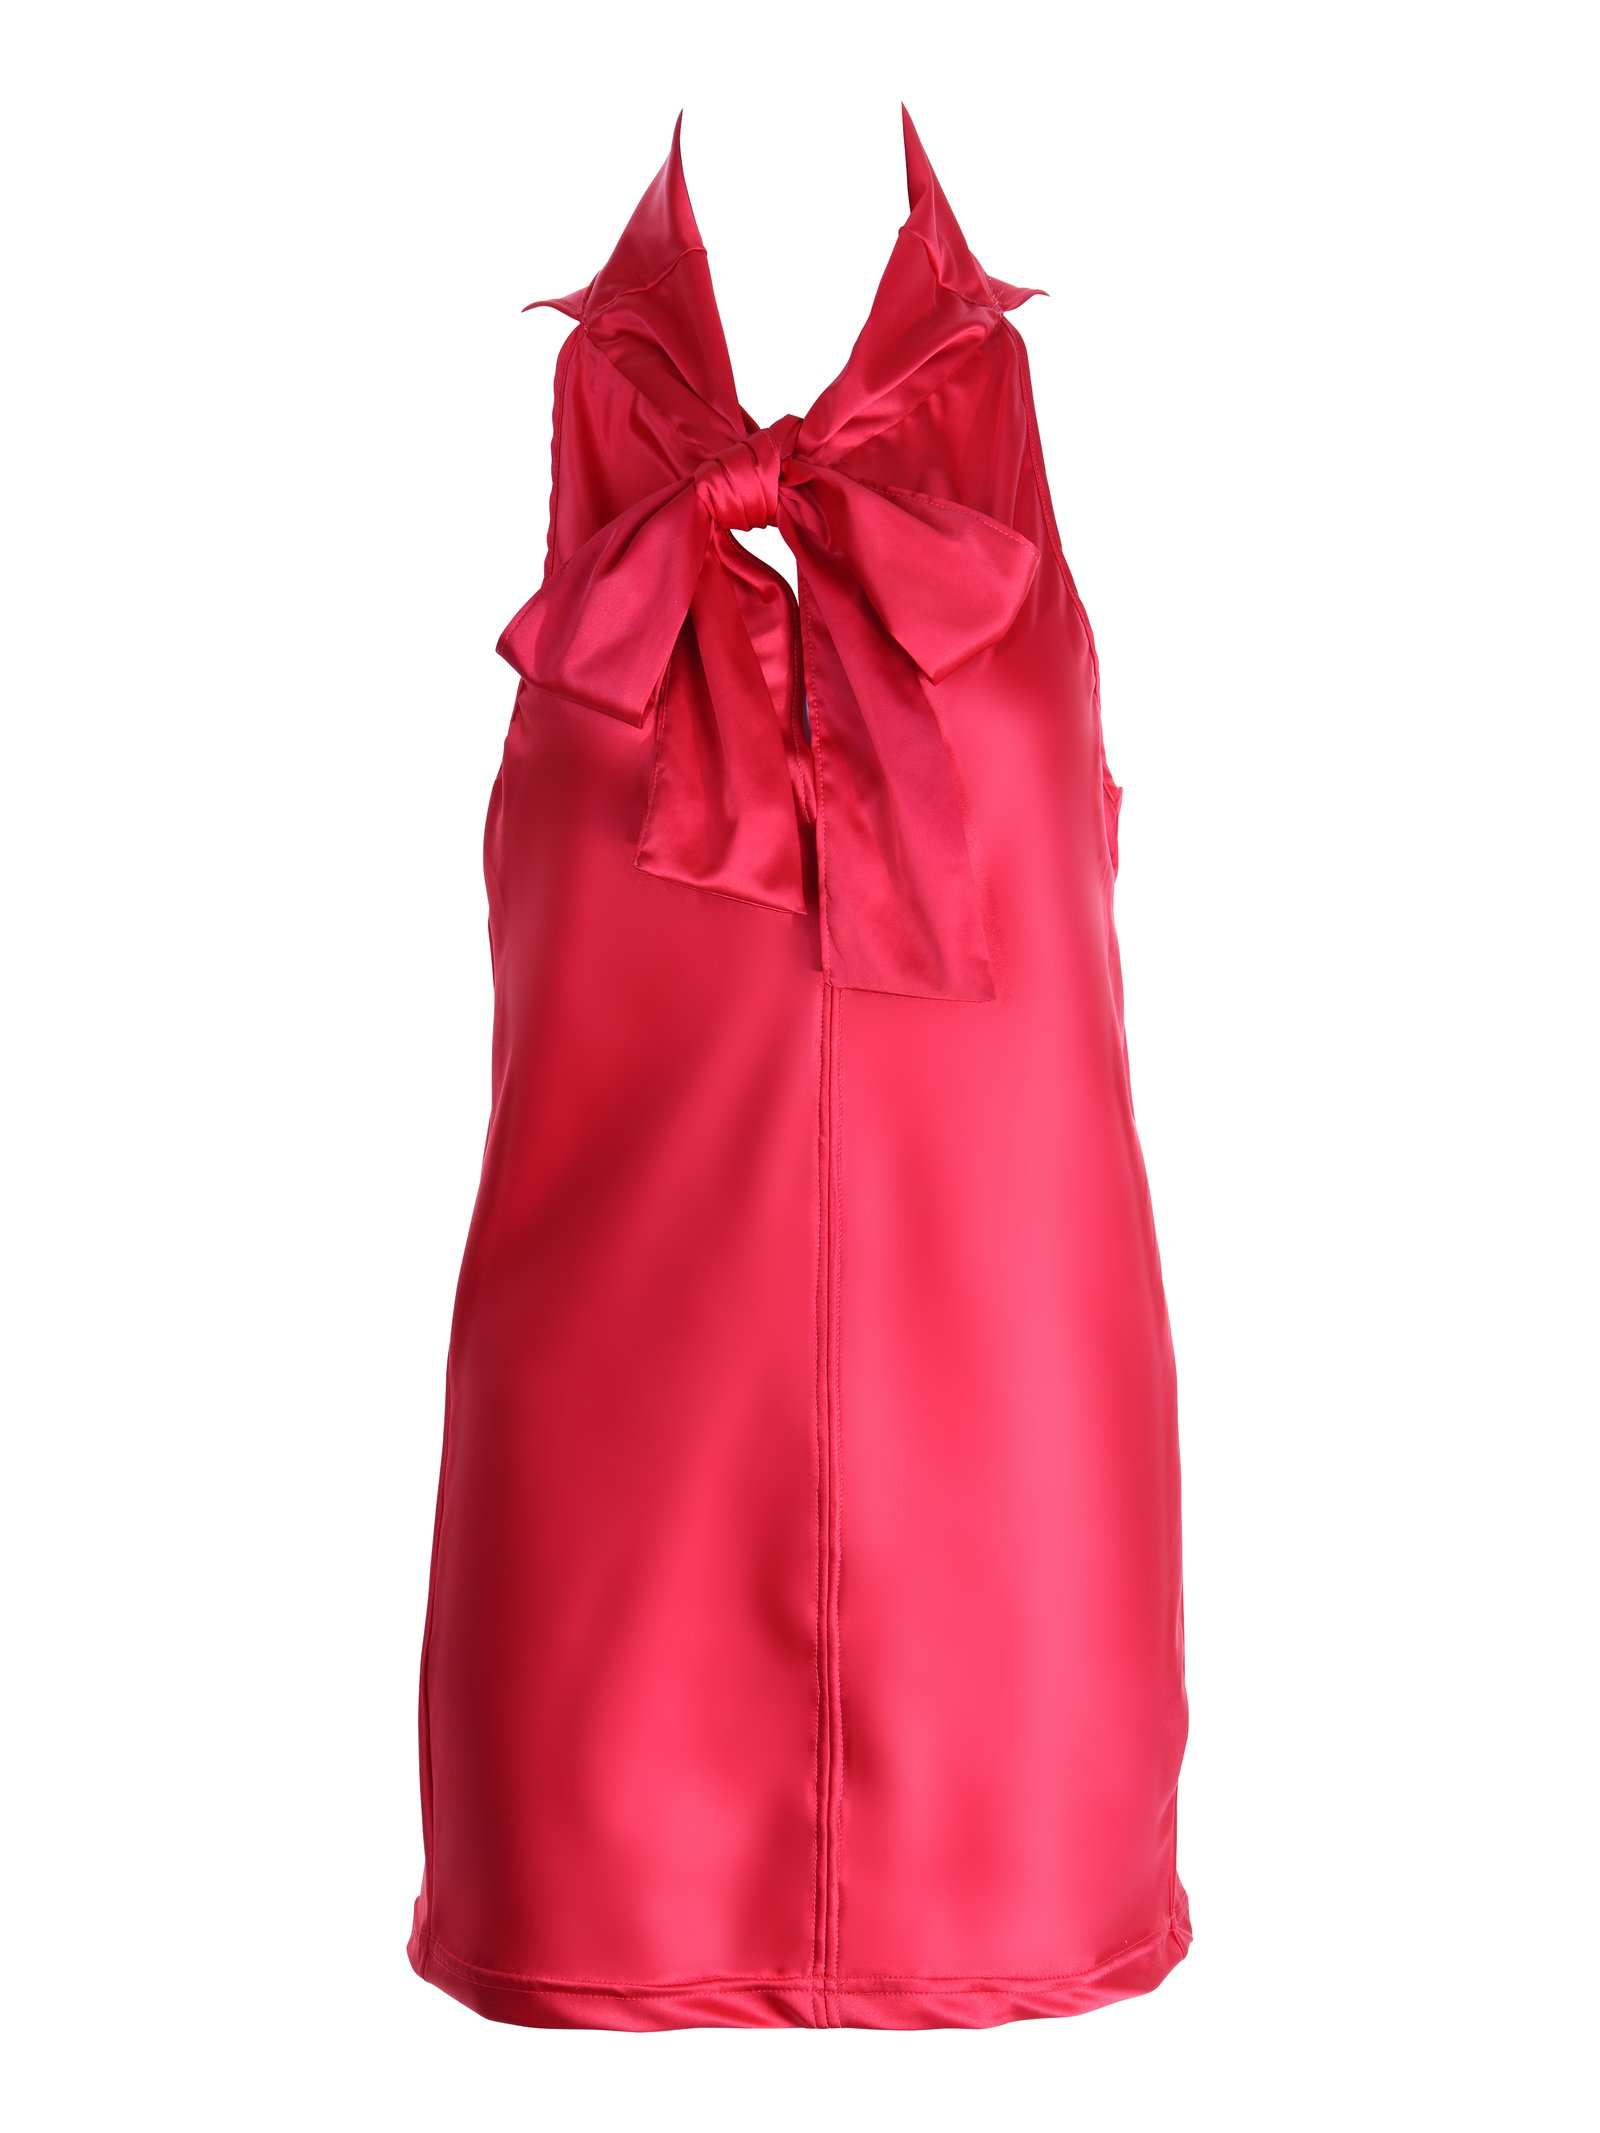 NightProwl Vermillion PussyCat Bow Dress